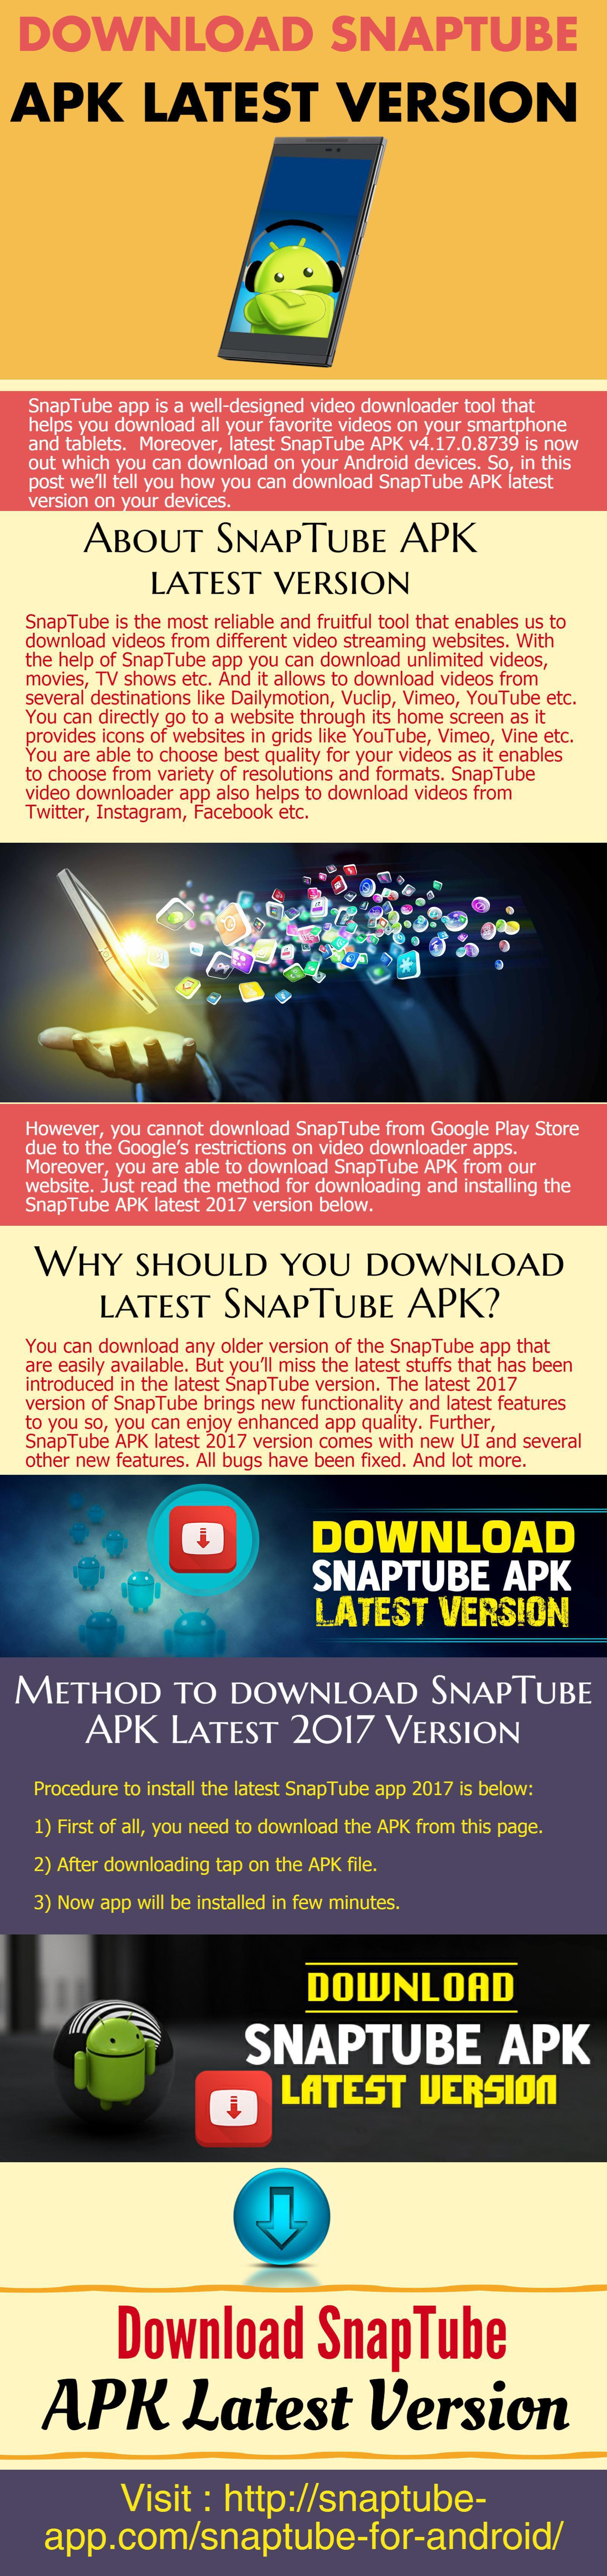 Download SnapTube APK Latest Version - LockerDome